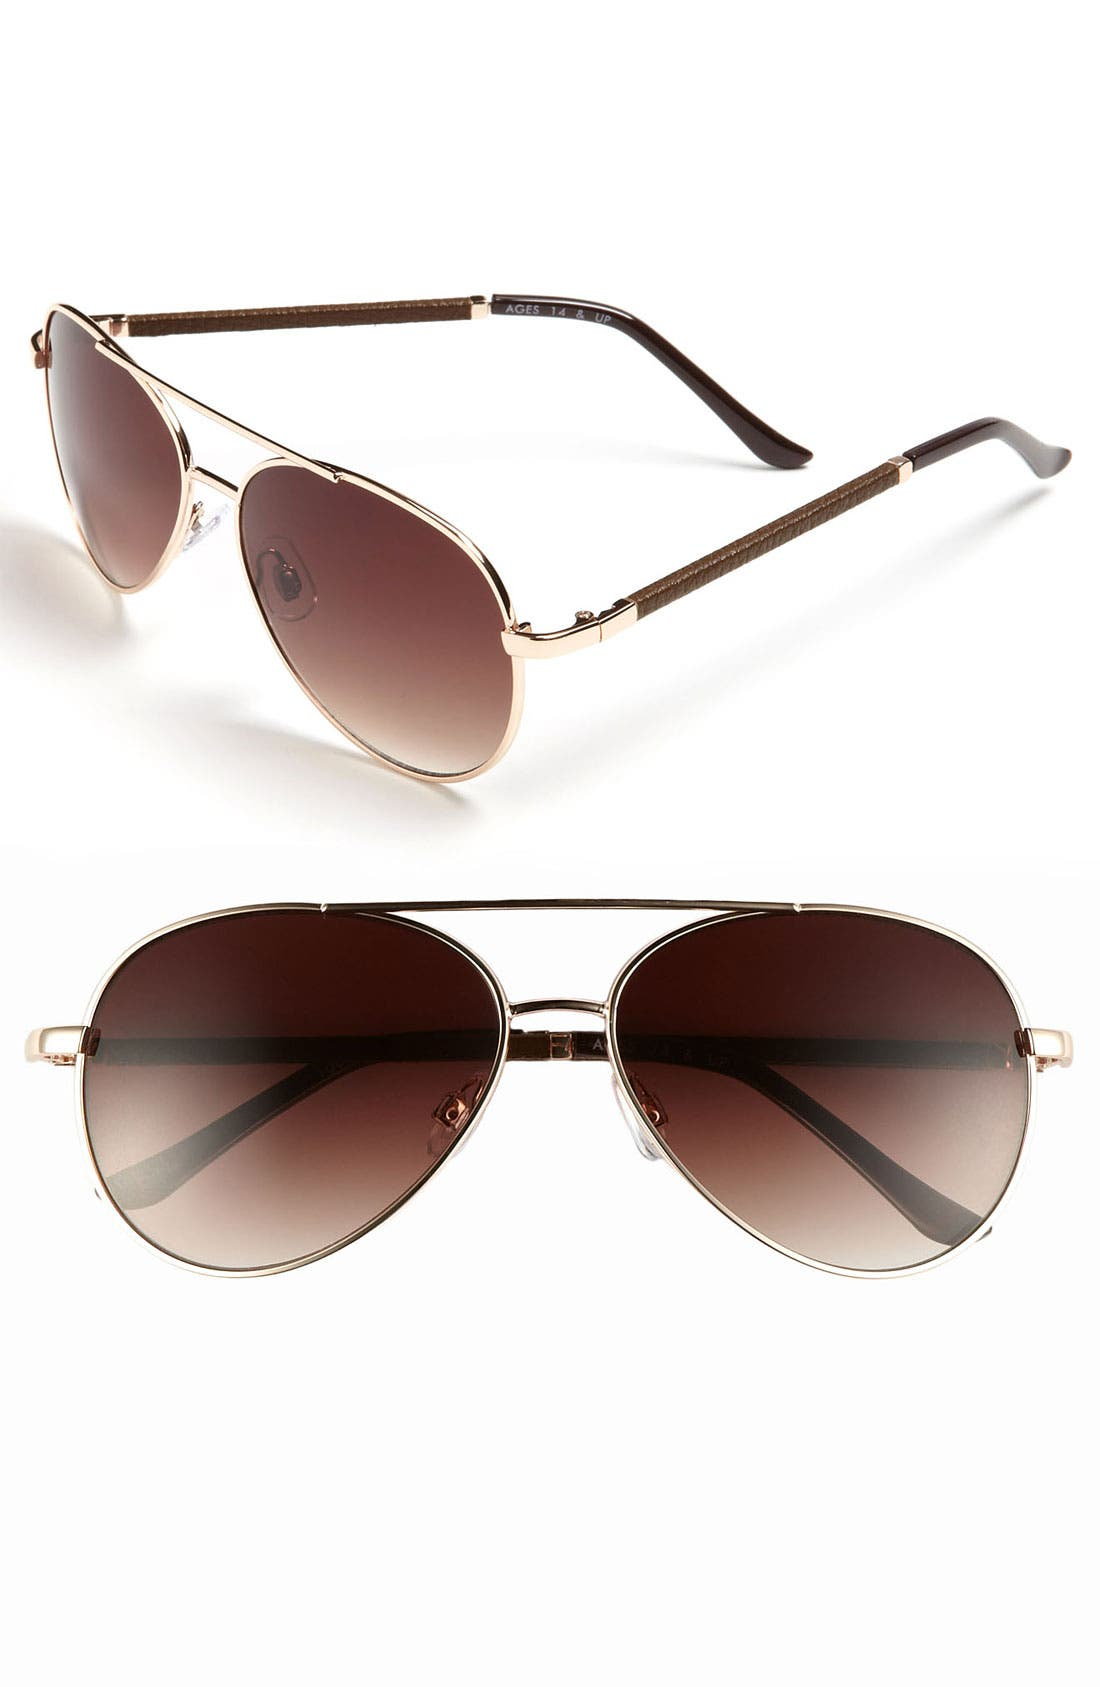 Alternate Image 1 Selected - FE NY 56mm Aviator Sunglasses